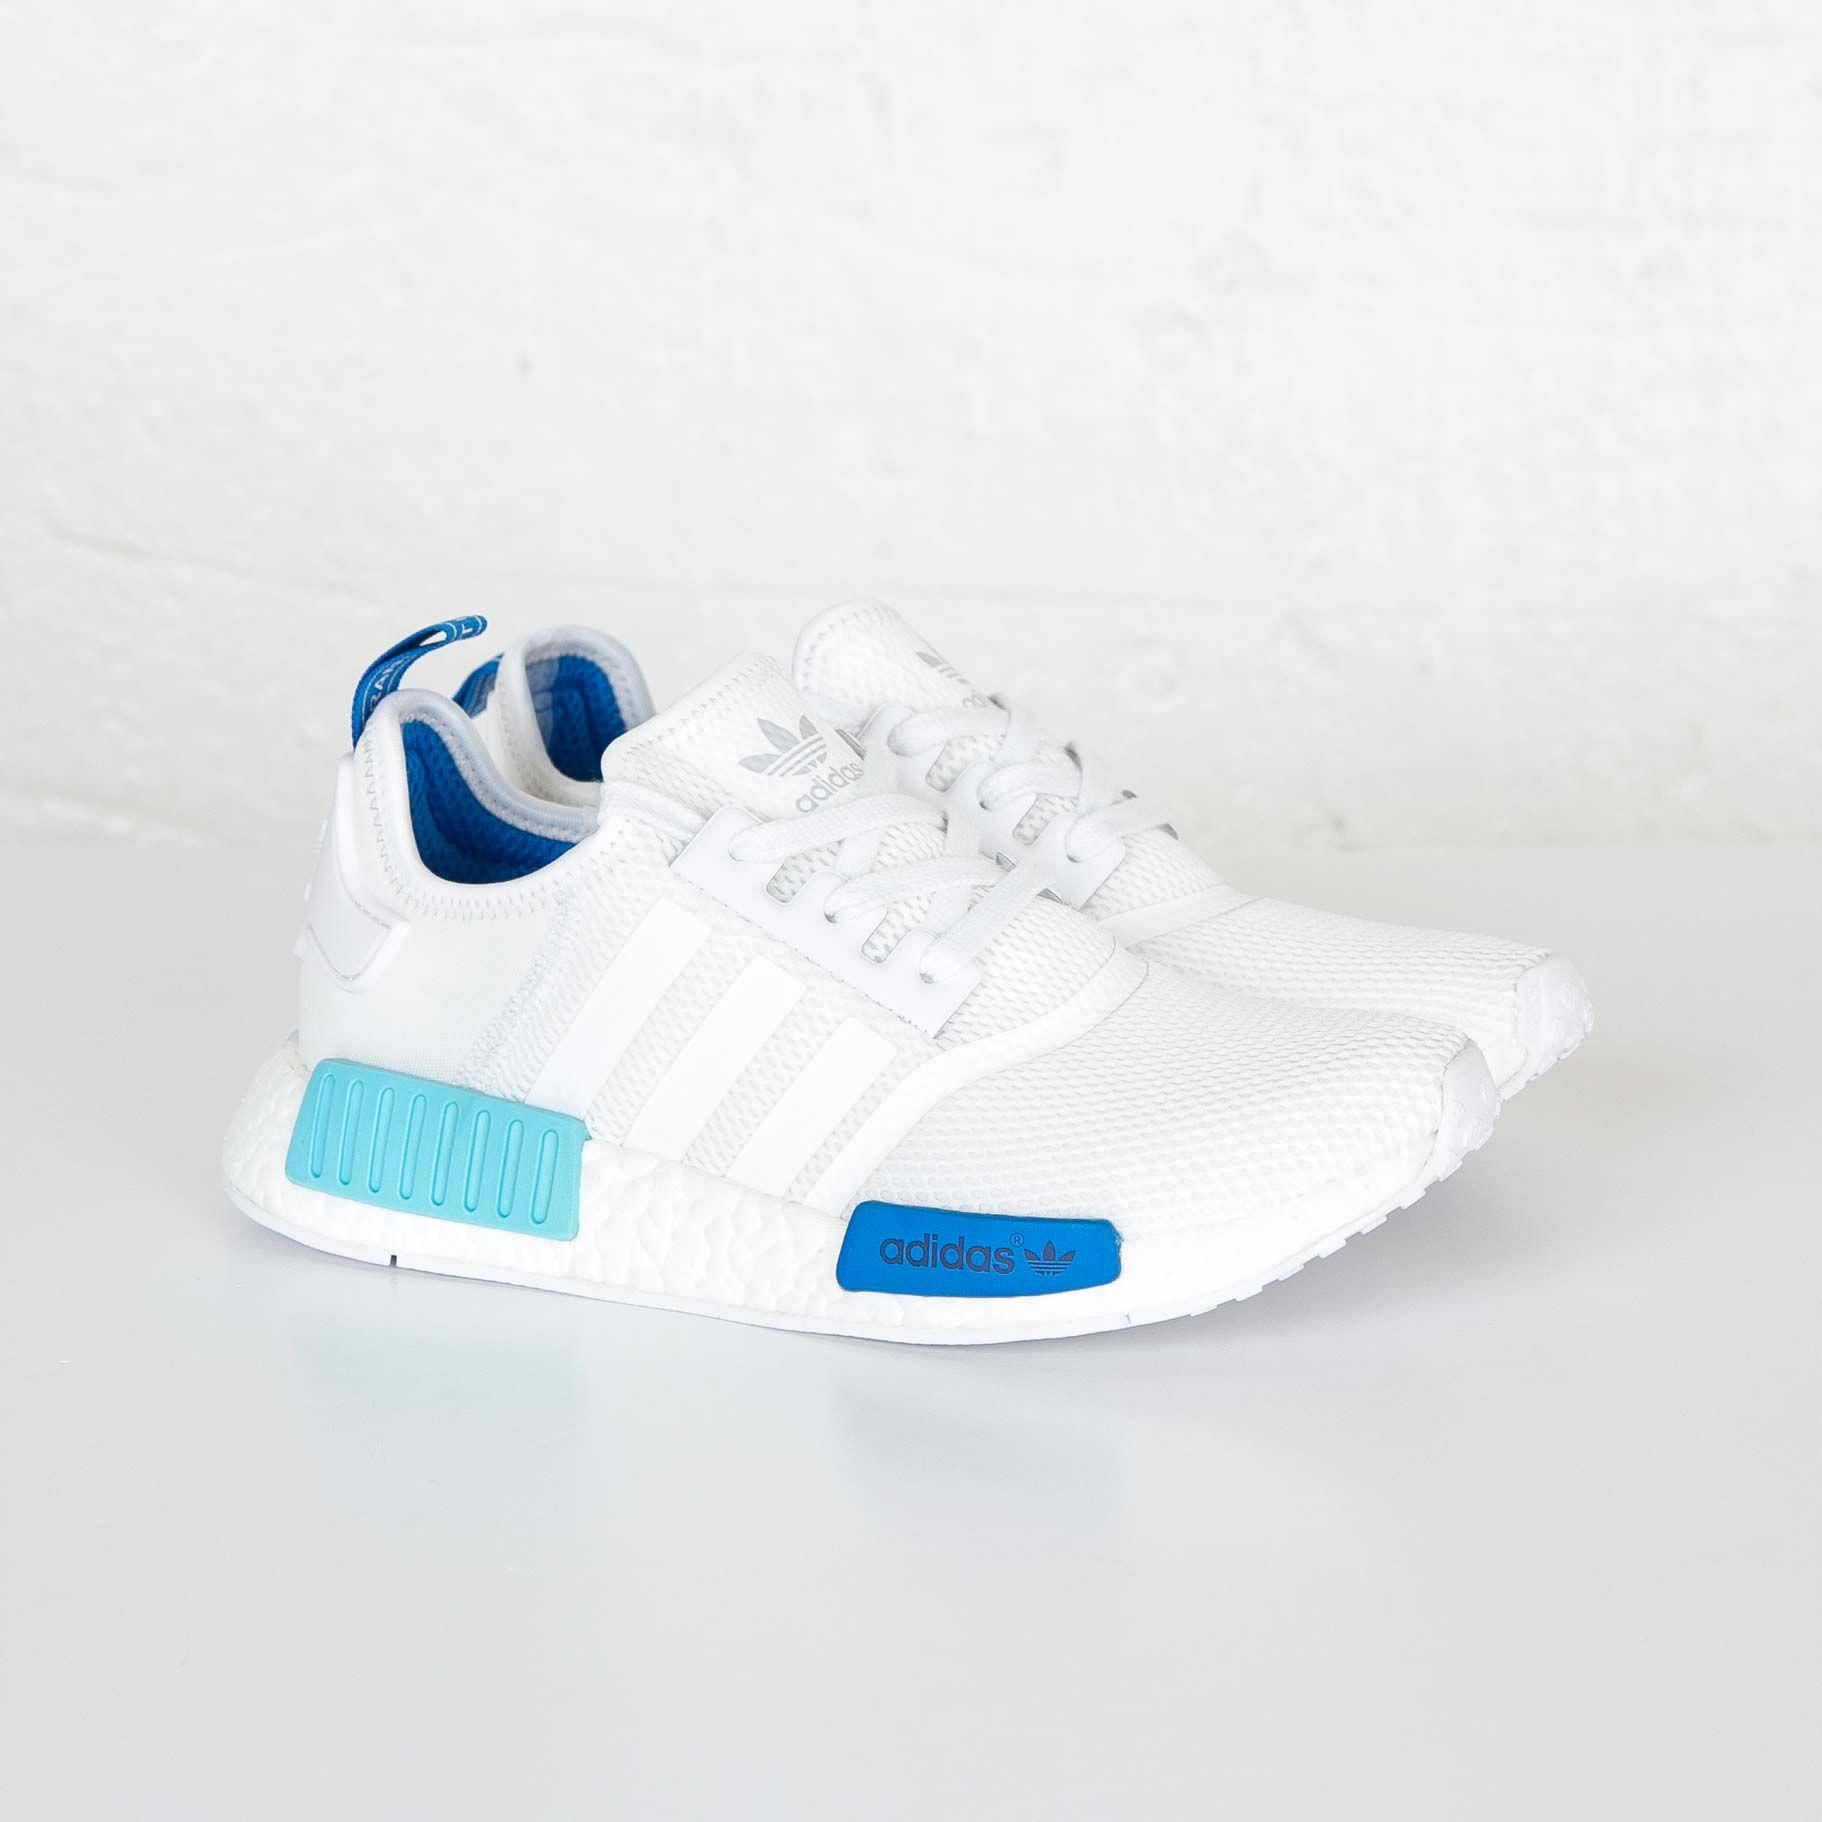 Nmd adidas women, Addidas shoes, Adidas